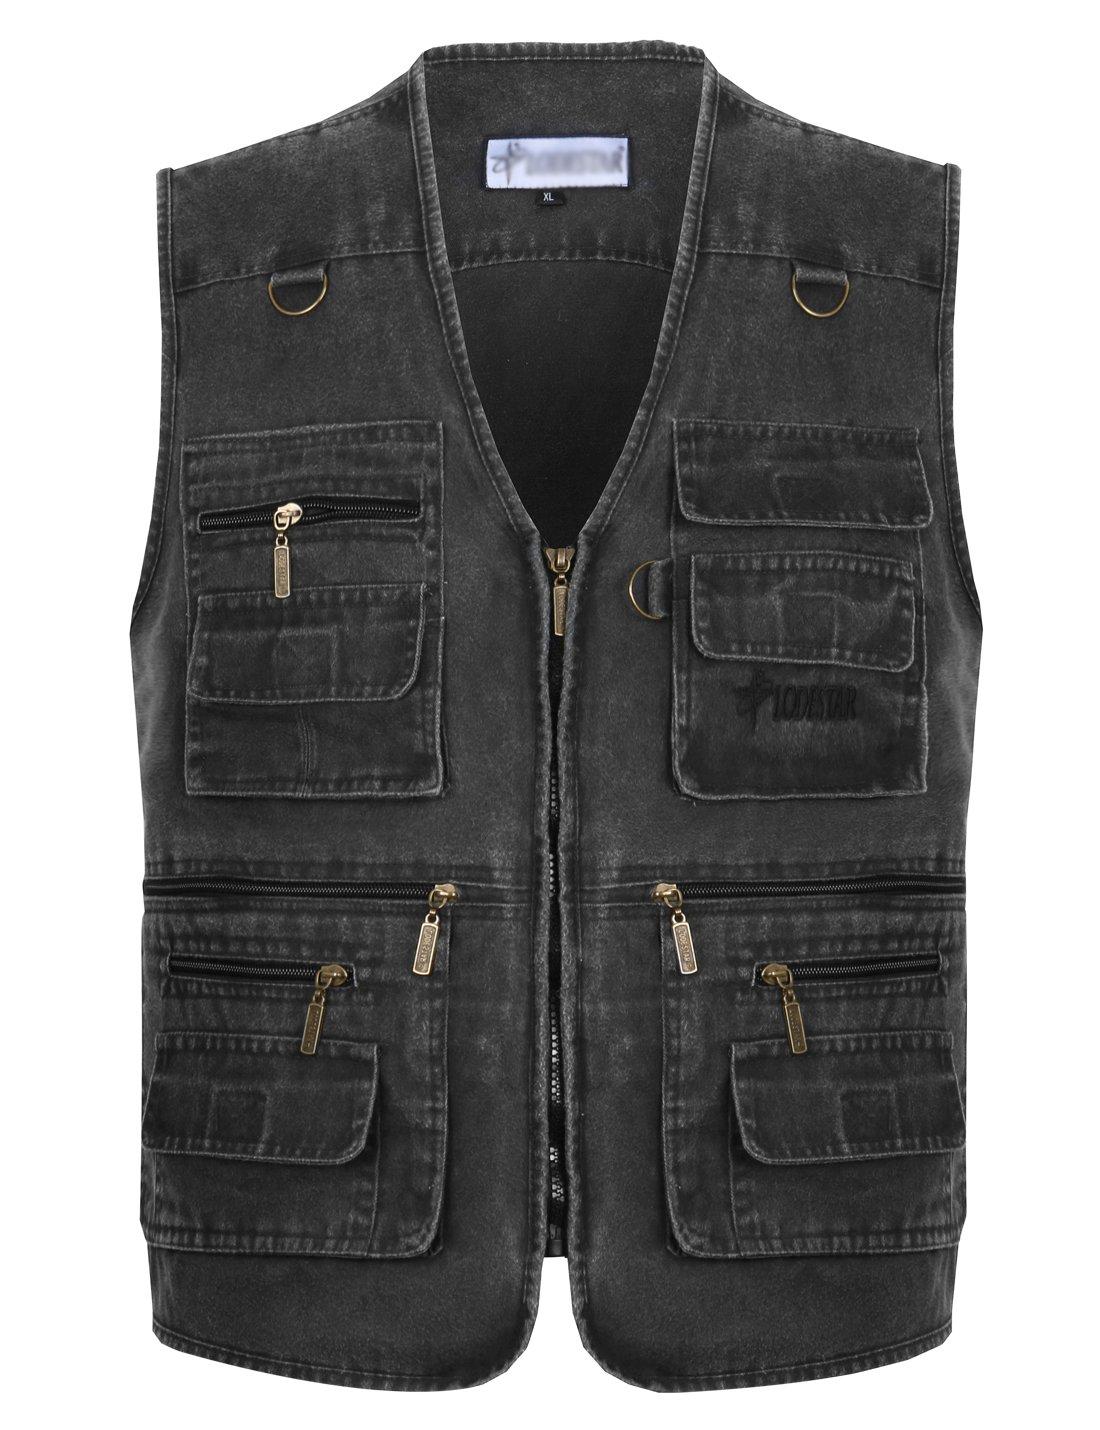 Gihuo Men's Casual Outdoor Leisure Lightweight Pockets Fishing Photo Journalist Denim Vest Plus Size (M, Grey)